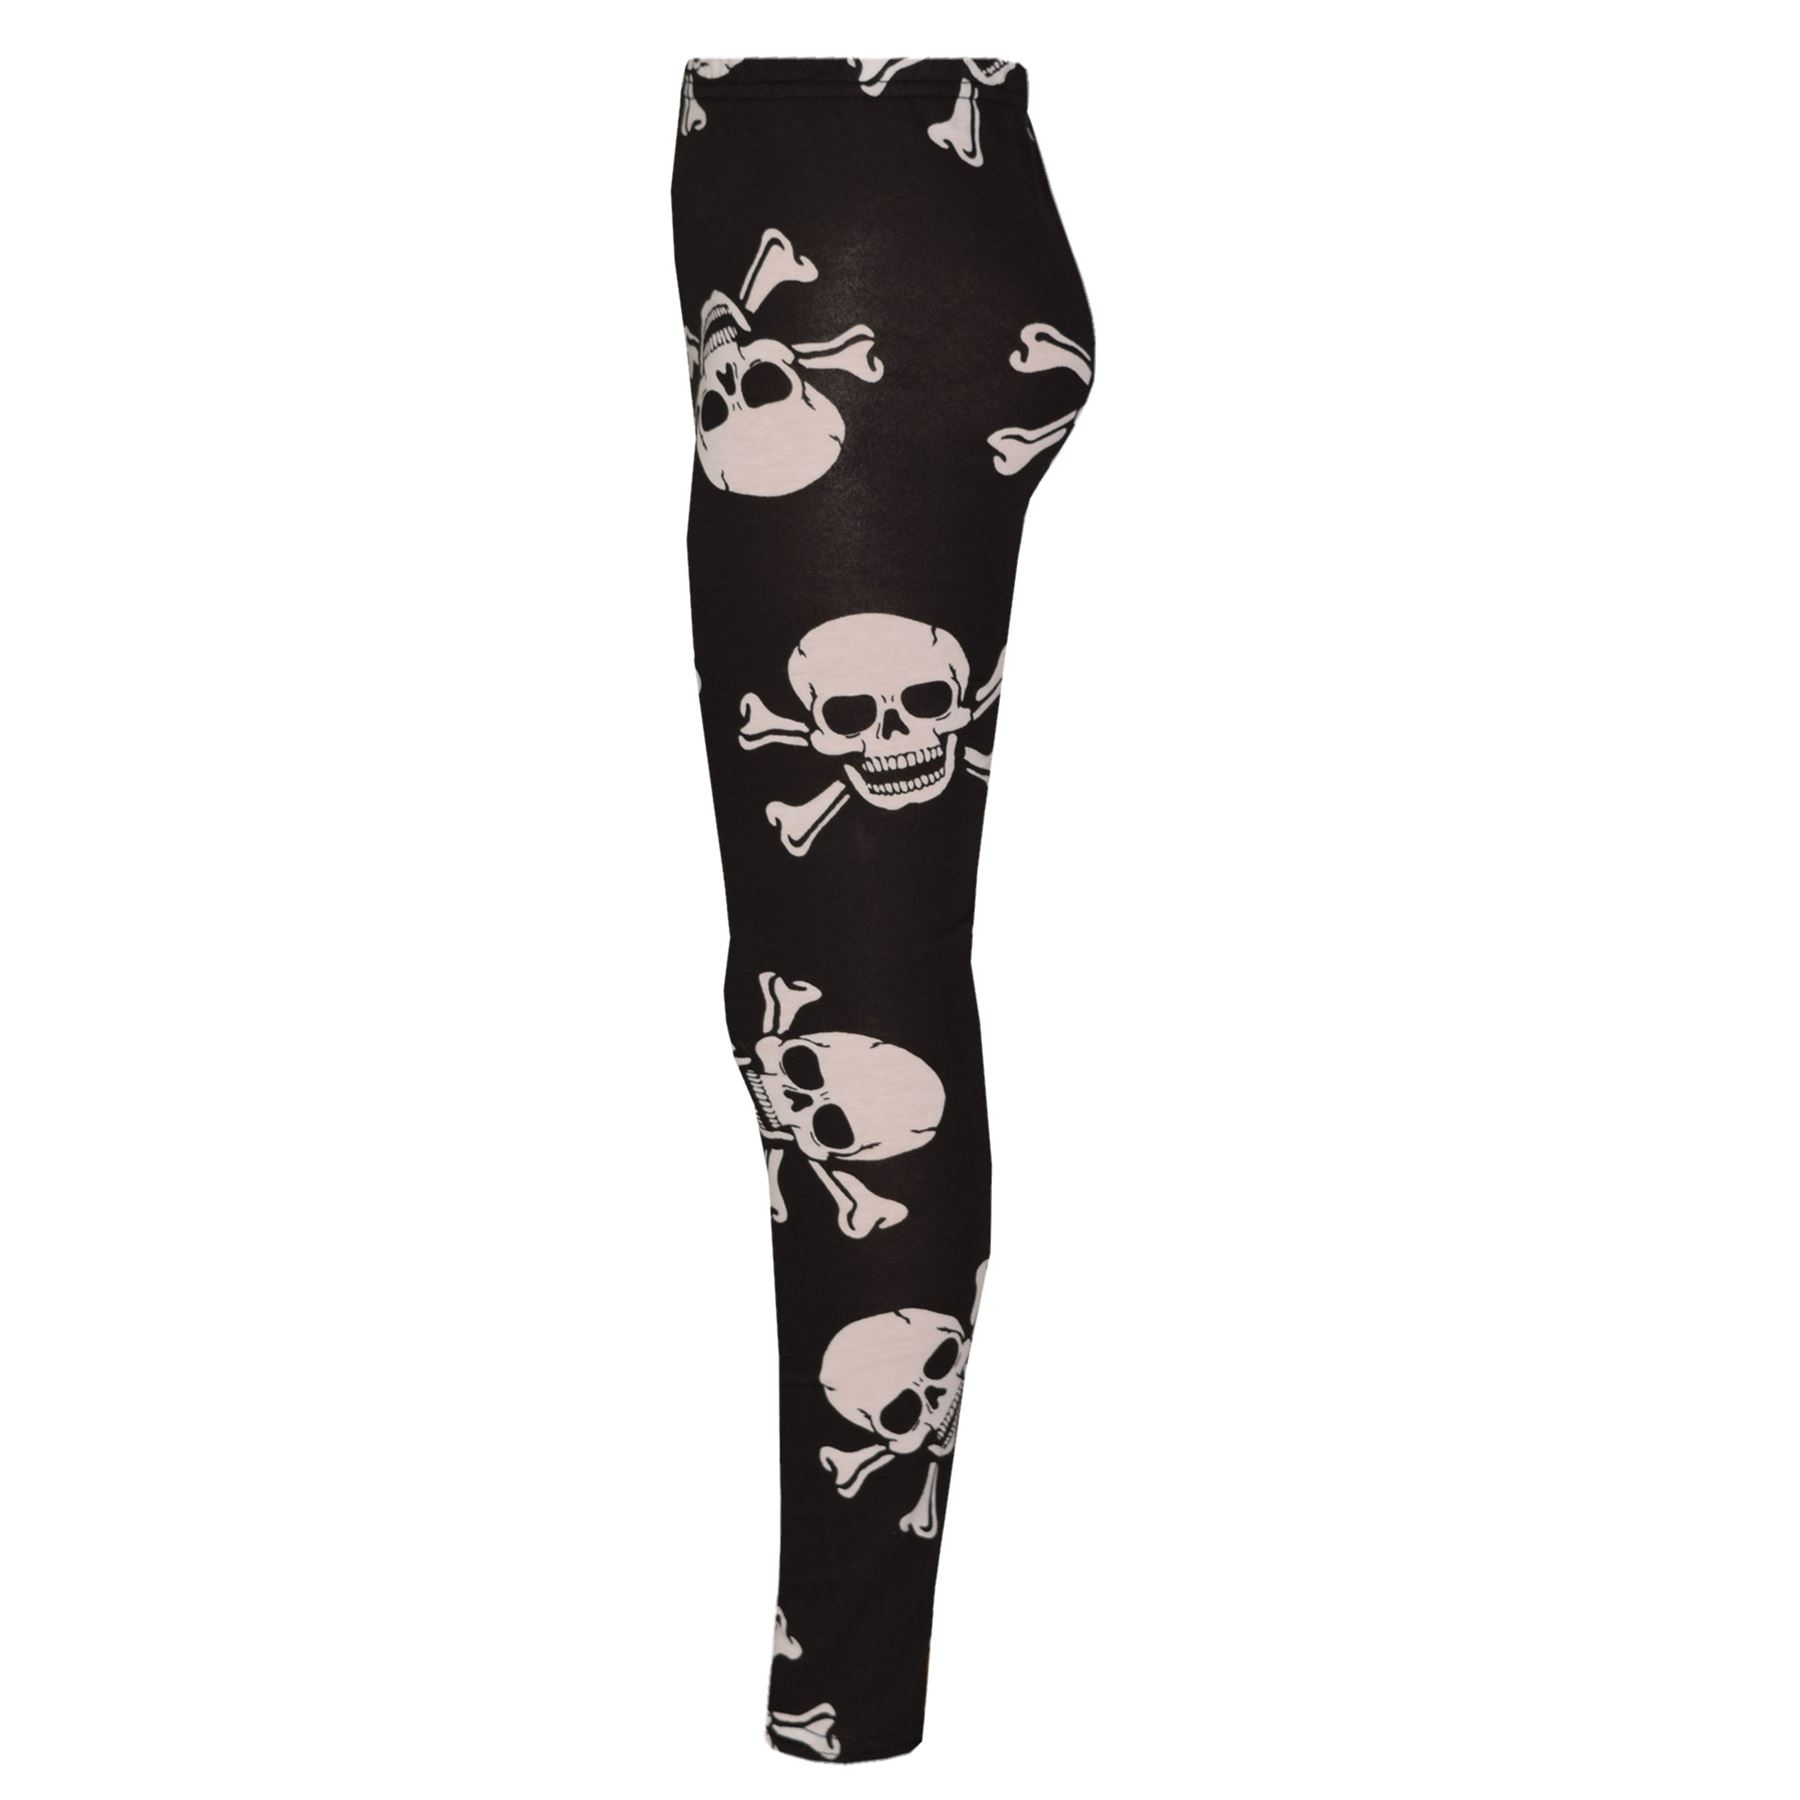 e1849dfa8cb9 Kids Girls Boys Halloween Skull Print Crop Top Legging Skater Dress ...